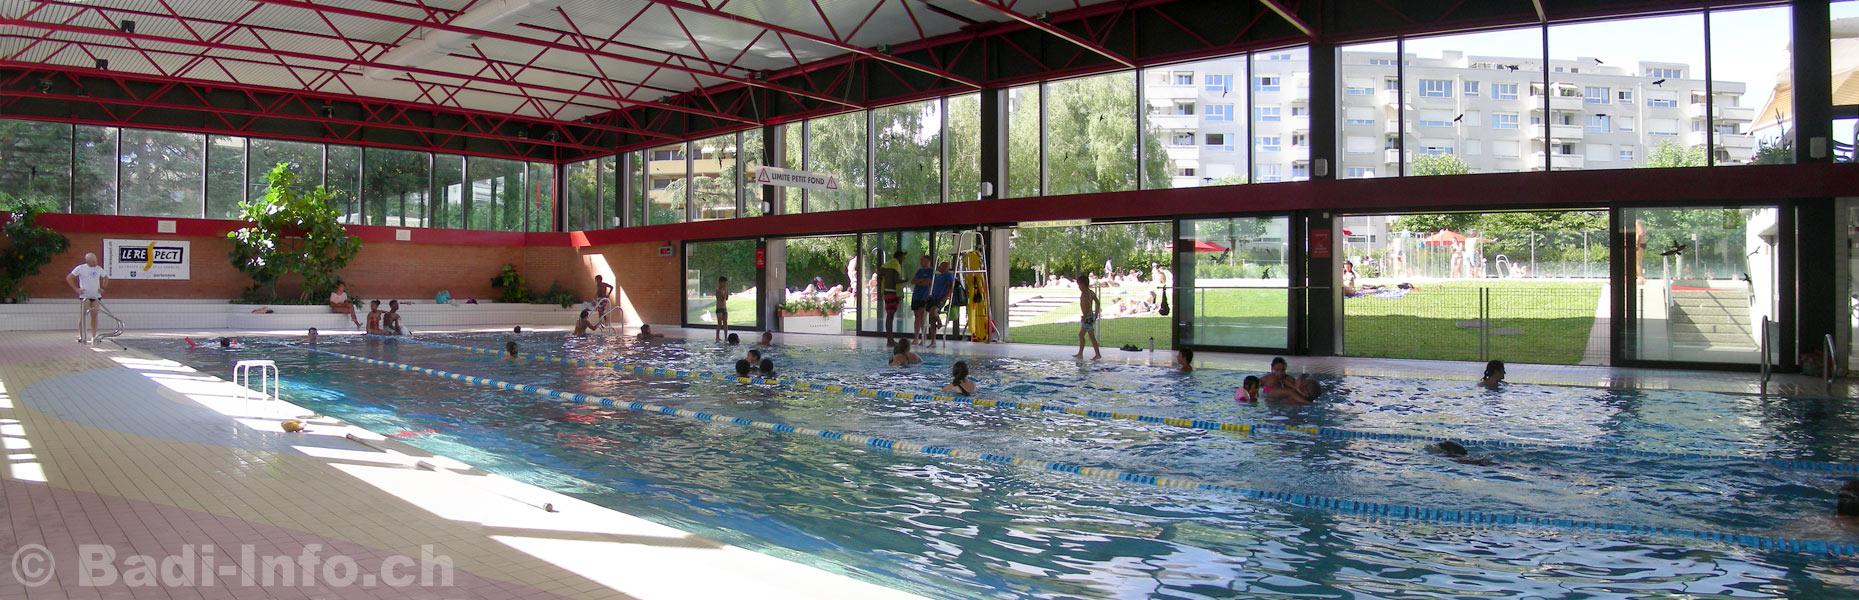 accessoire piscine geneve